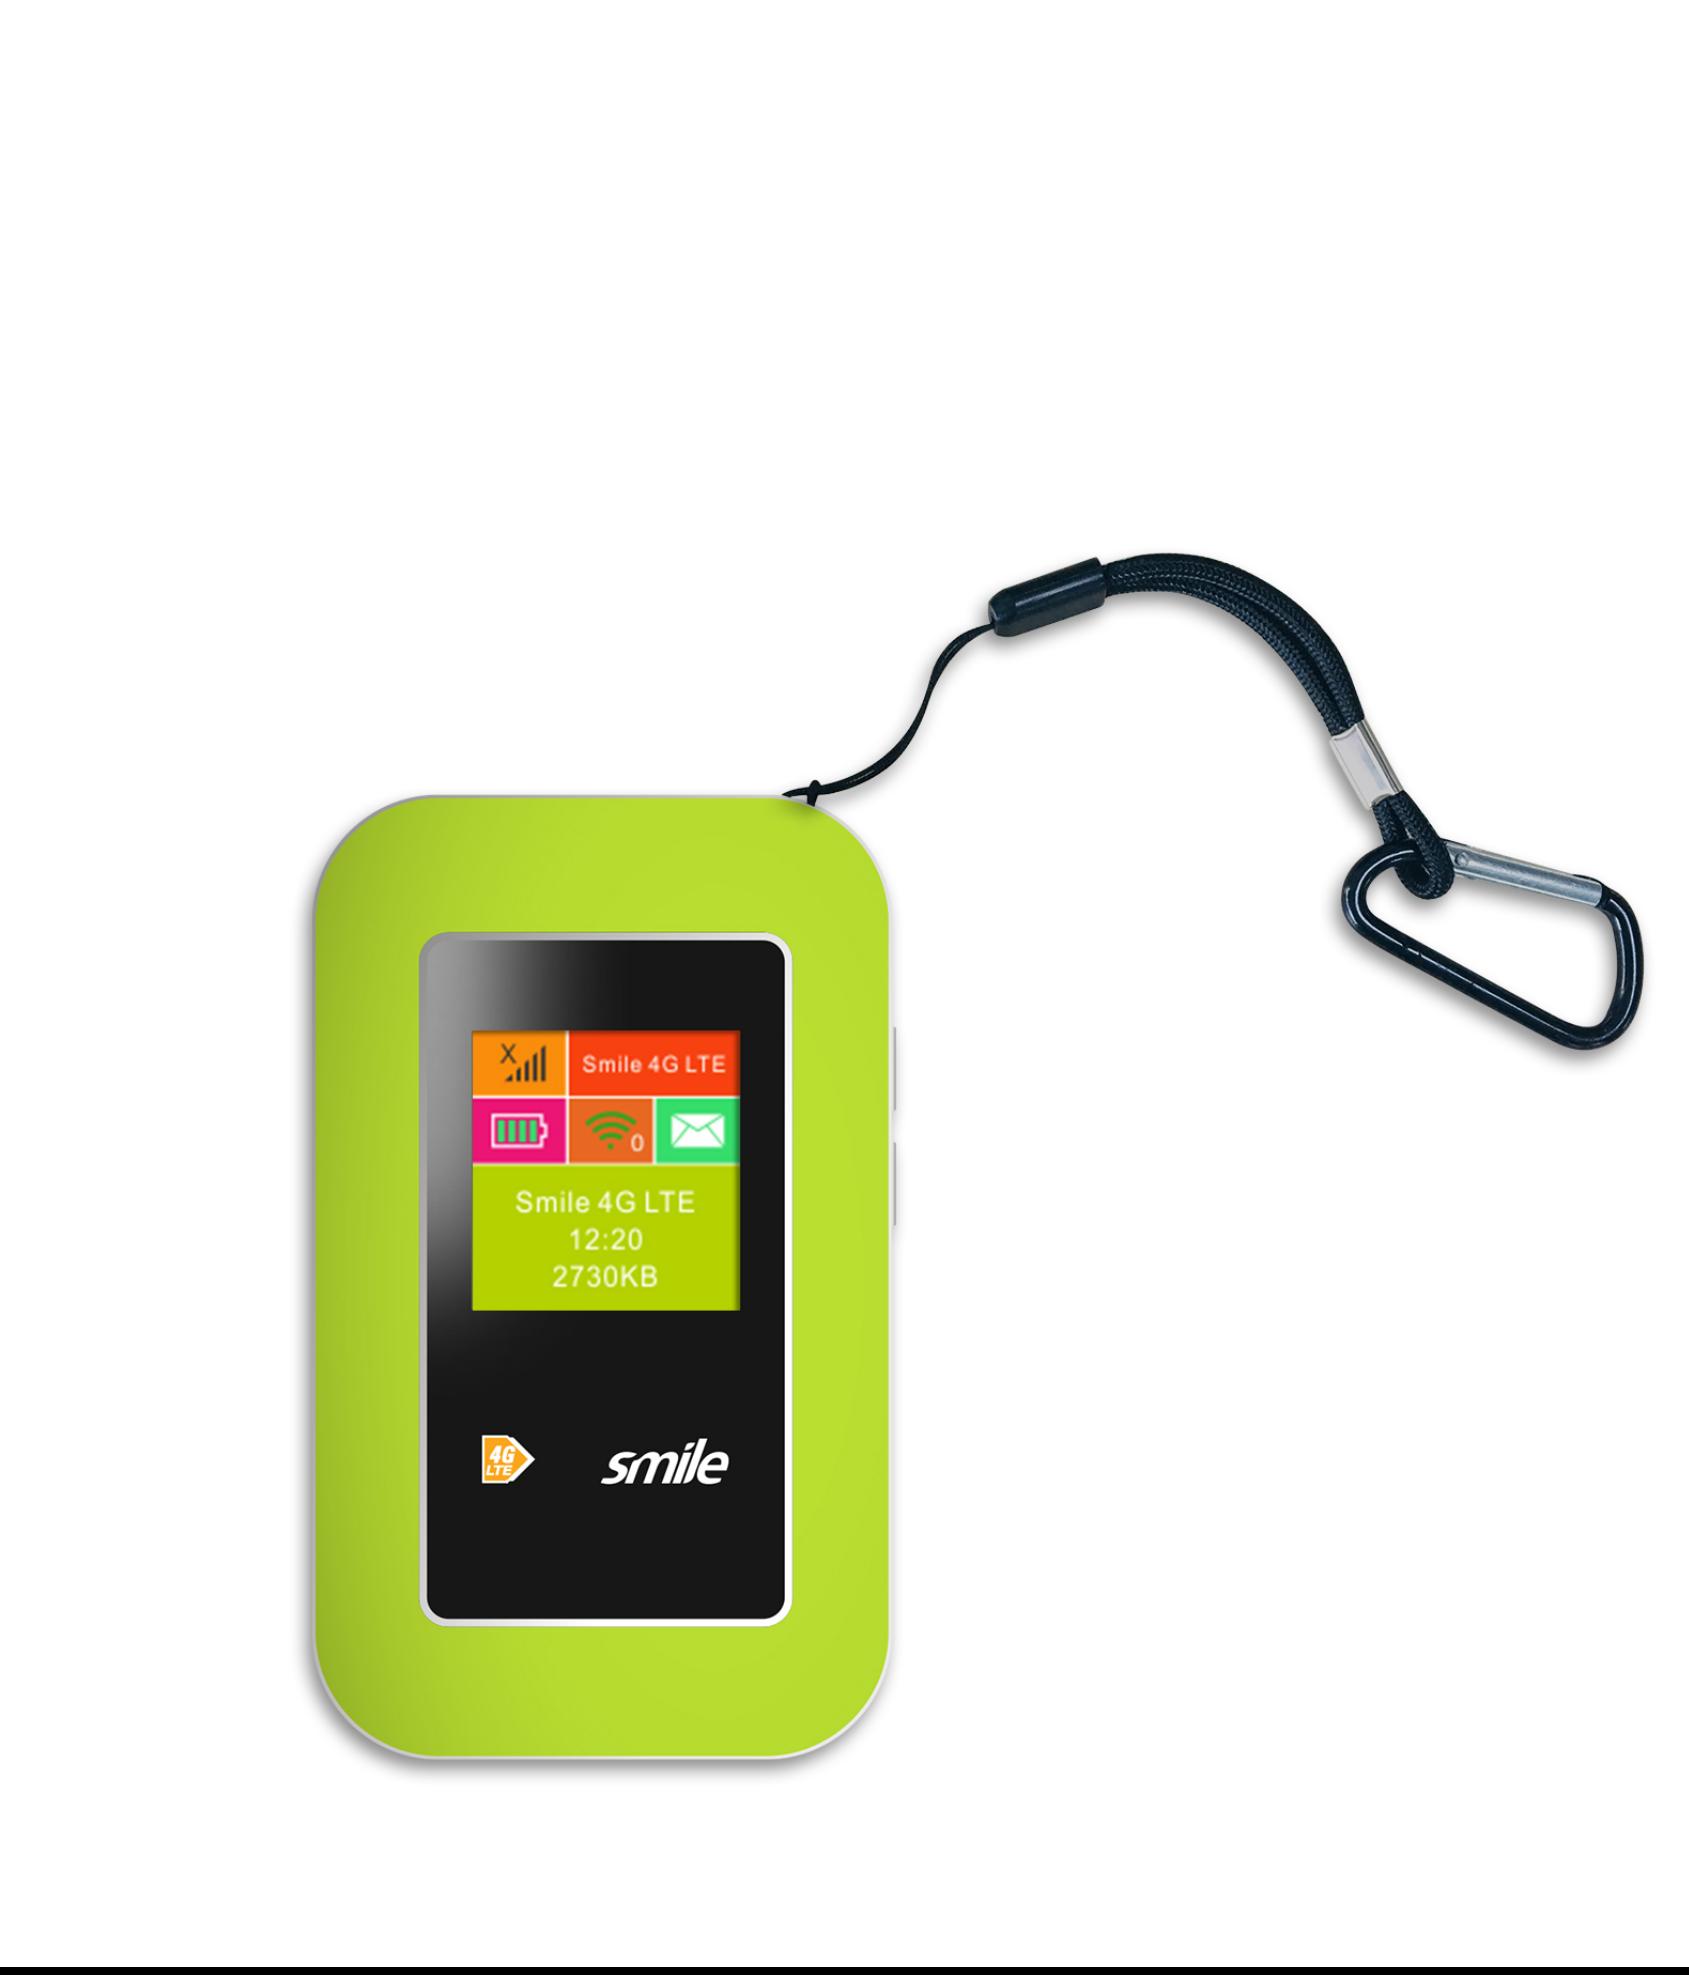 15GB + MiFi + FREE calls